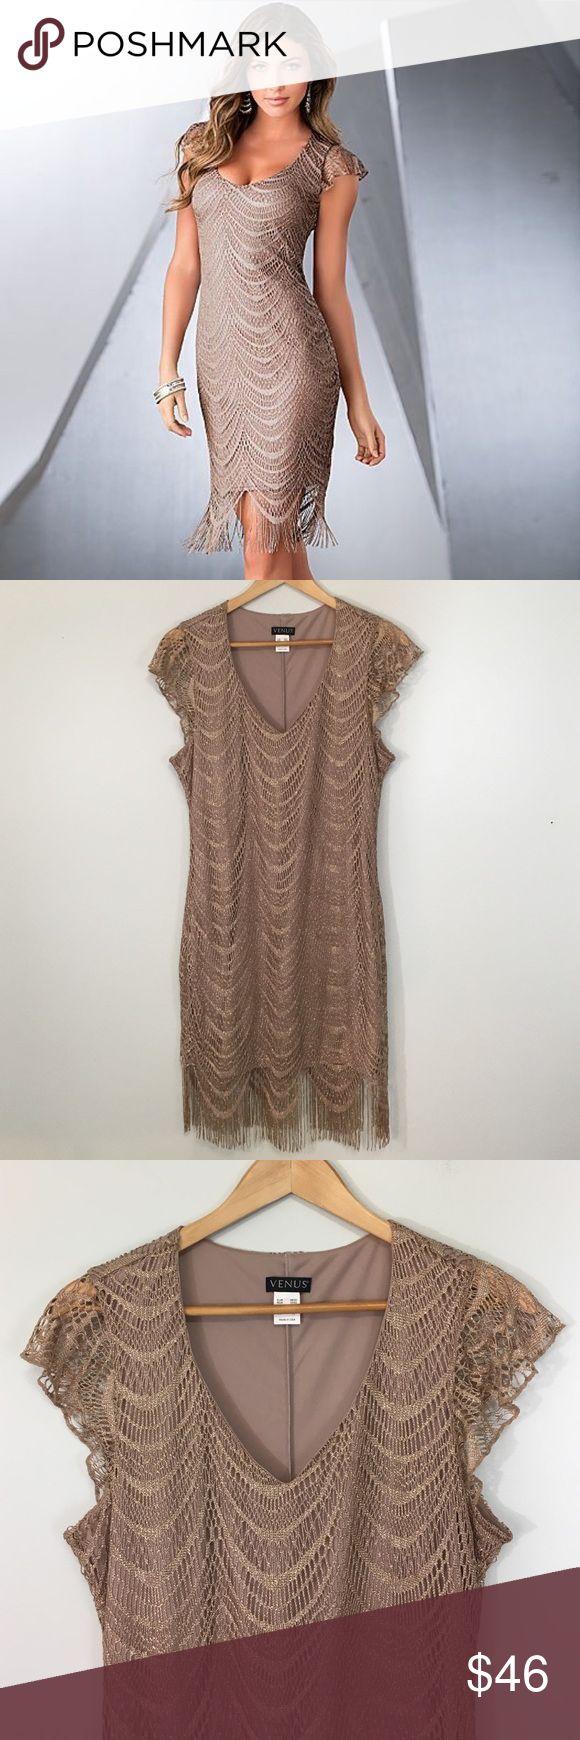 "Venus Gold Sparkle Fringe Dress Dress: EUC - Venus / Under arm to arm: 21"" L: 34"" Length of Fringe 40"" Venus Dresses"